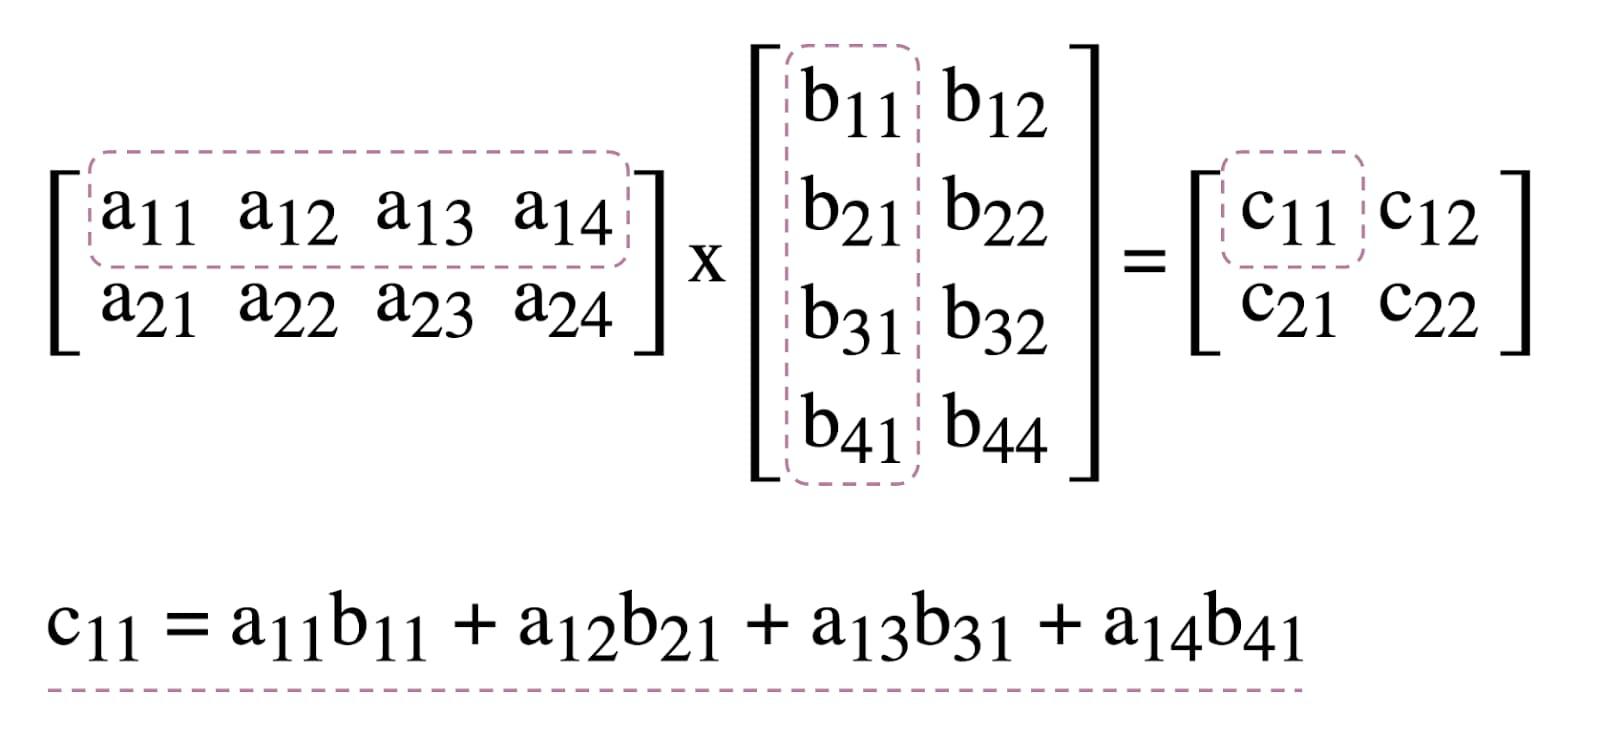 WebGPU 通用计算(计算管线、计算着色器)入门:矩阵相乘